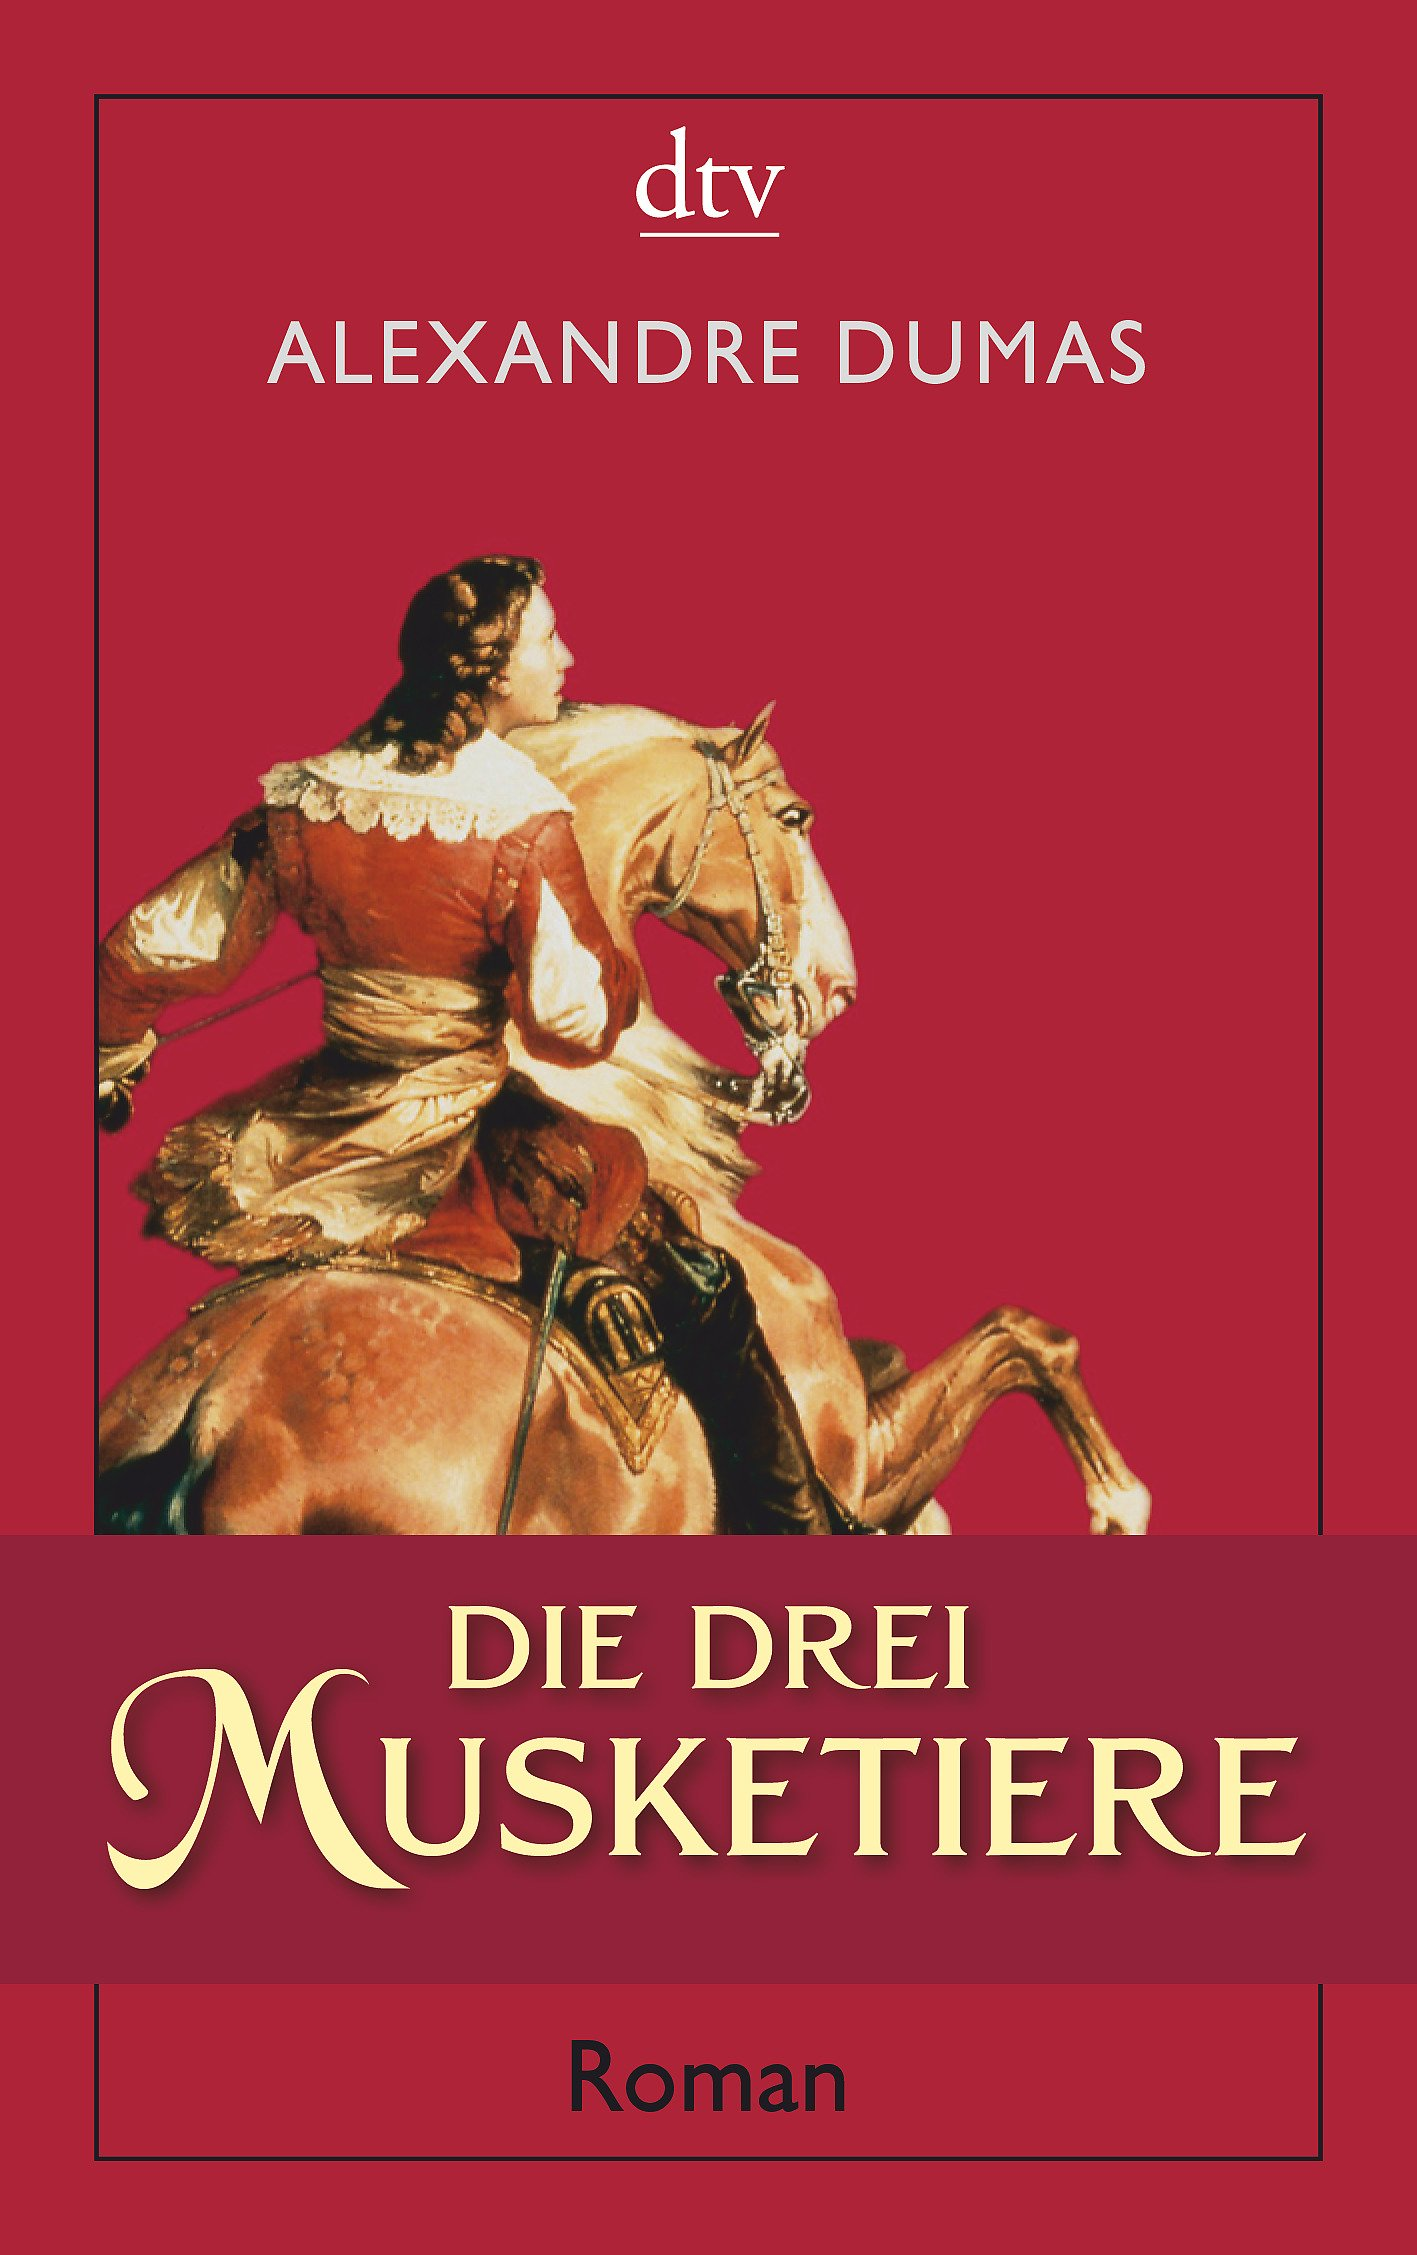 Die drei Musketiere: Roman Taschenbuch – 1. September 2009 Alexandre Dumas Michaela Meßner A. Zoller dtv Verlagsgesellschaft